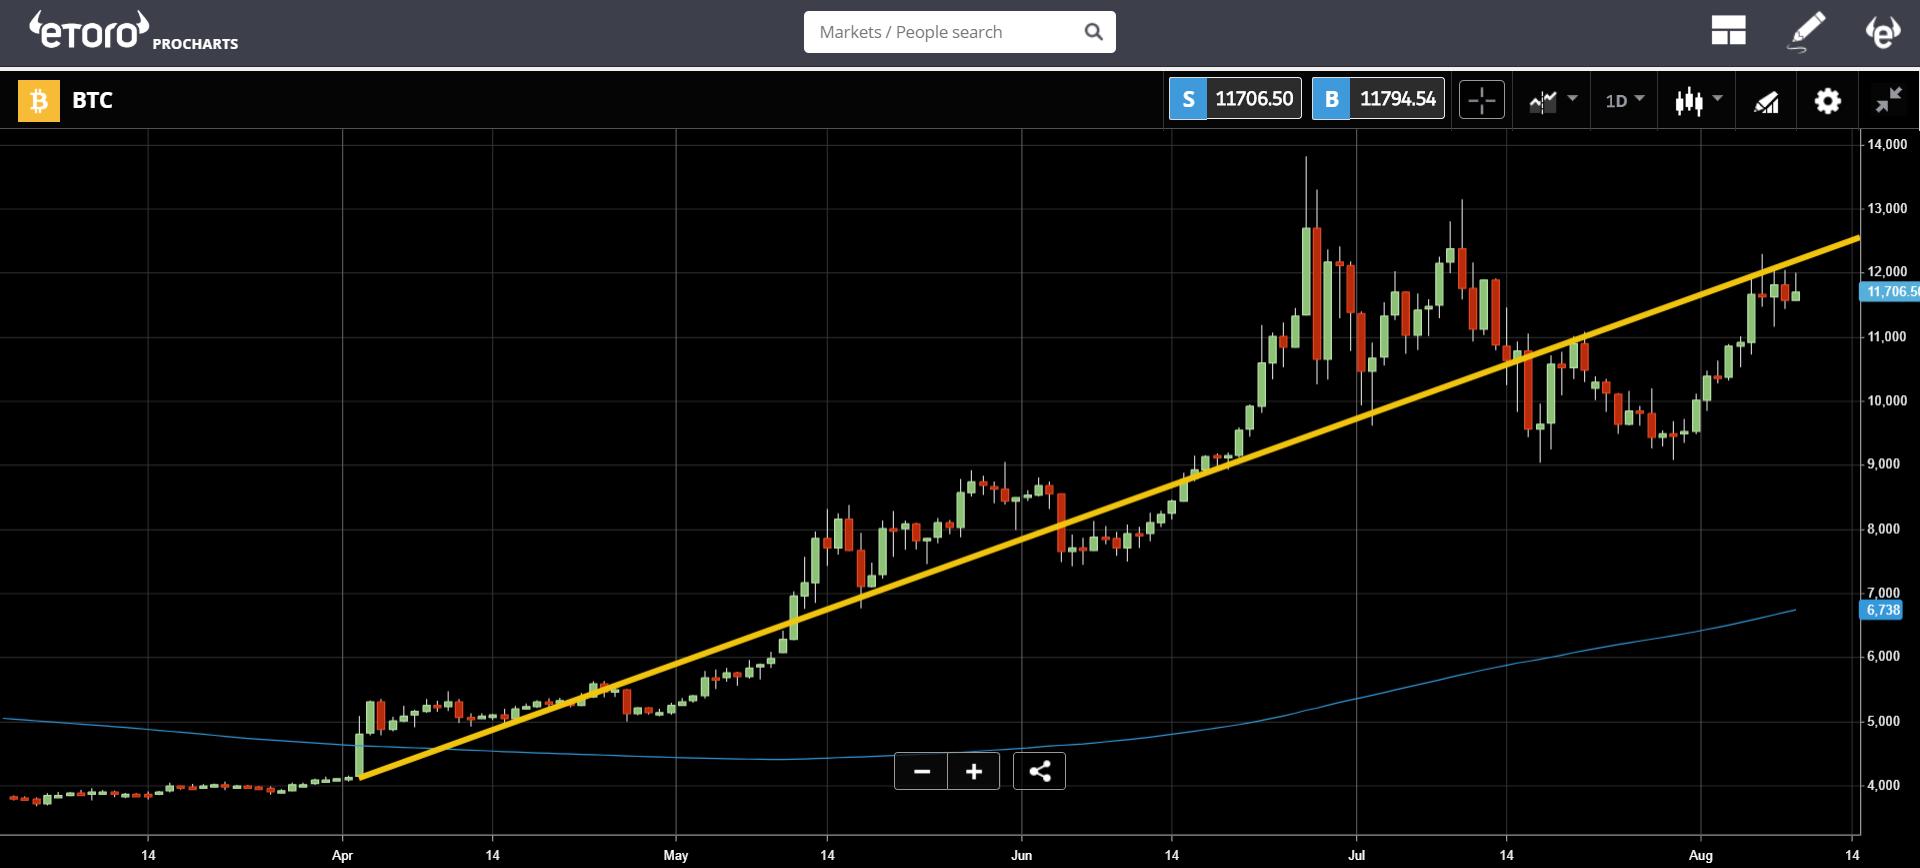 market, cryptocurrency, crypto, bitcoin, blockchain, ethereum, trading